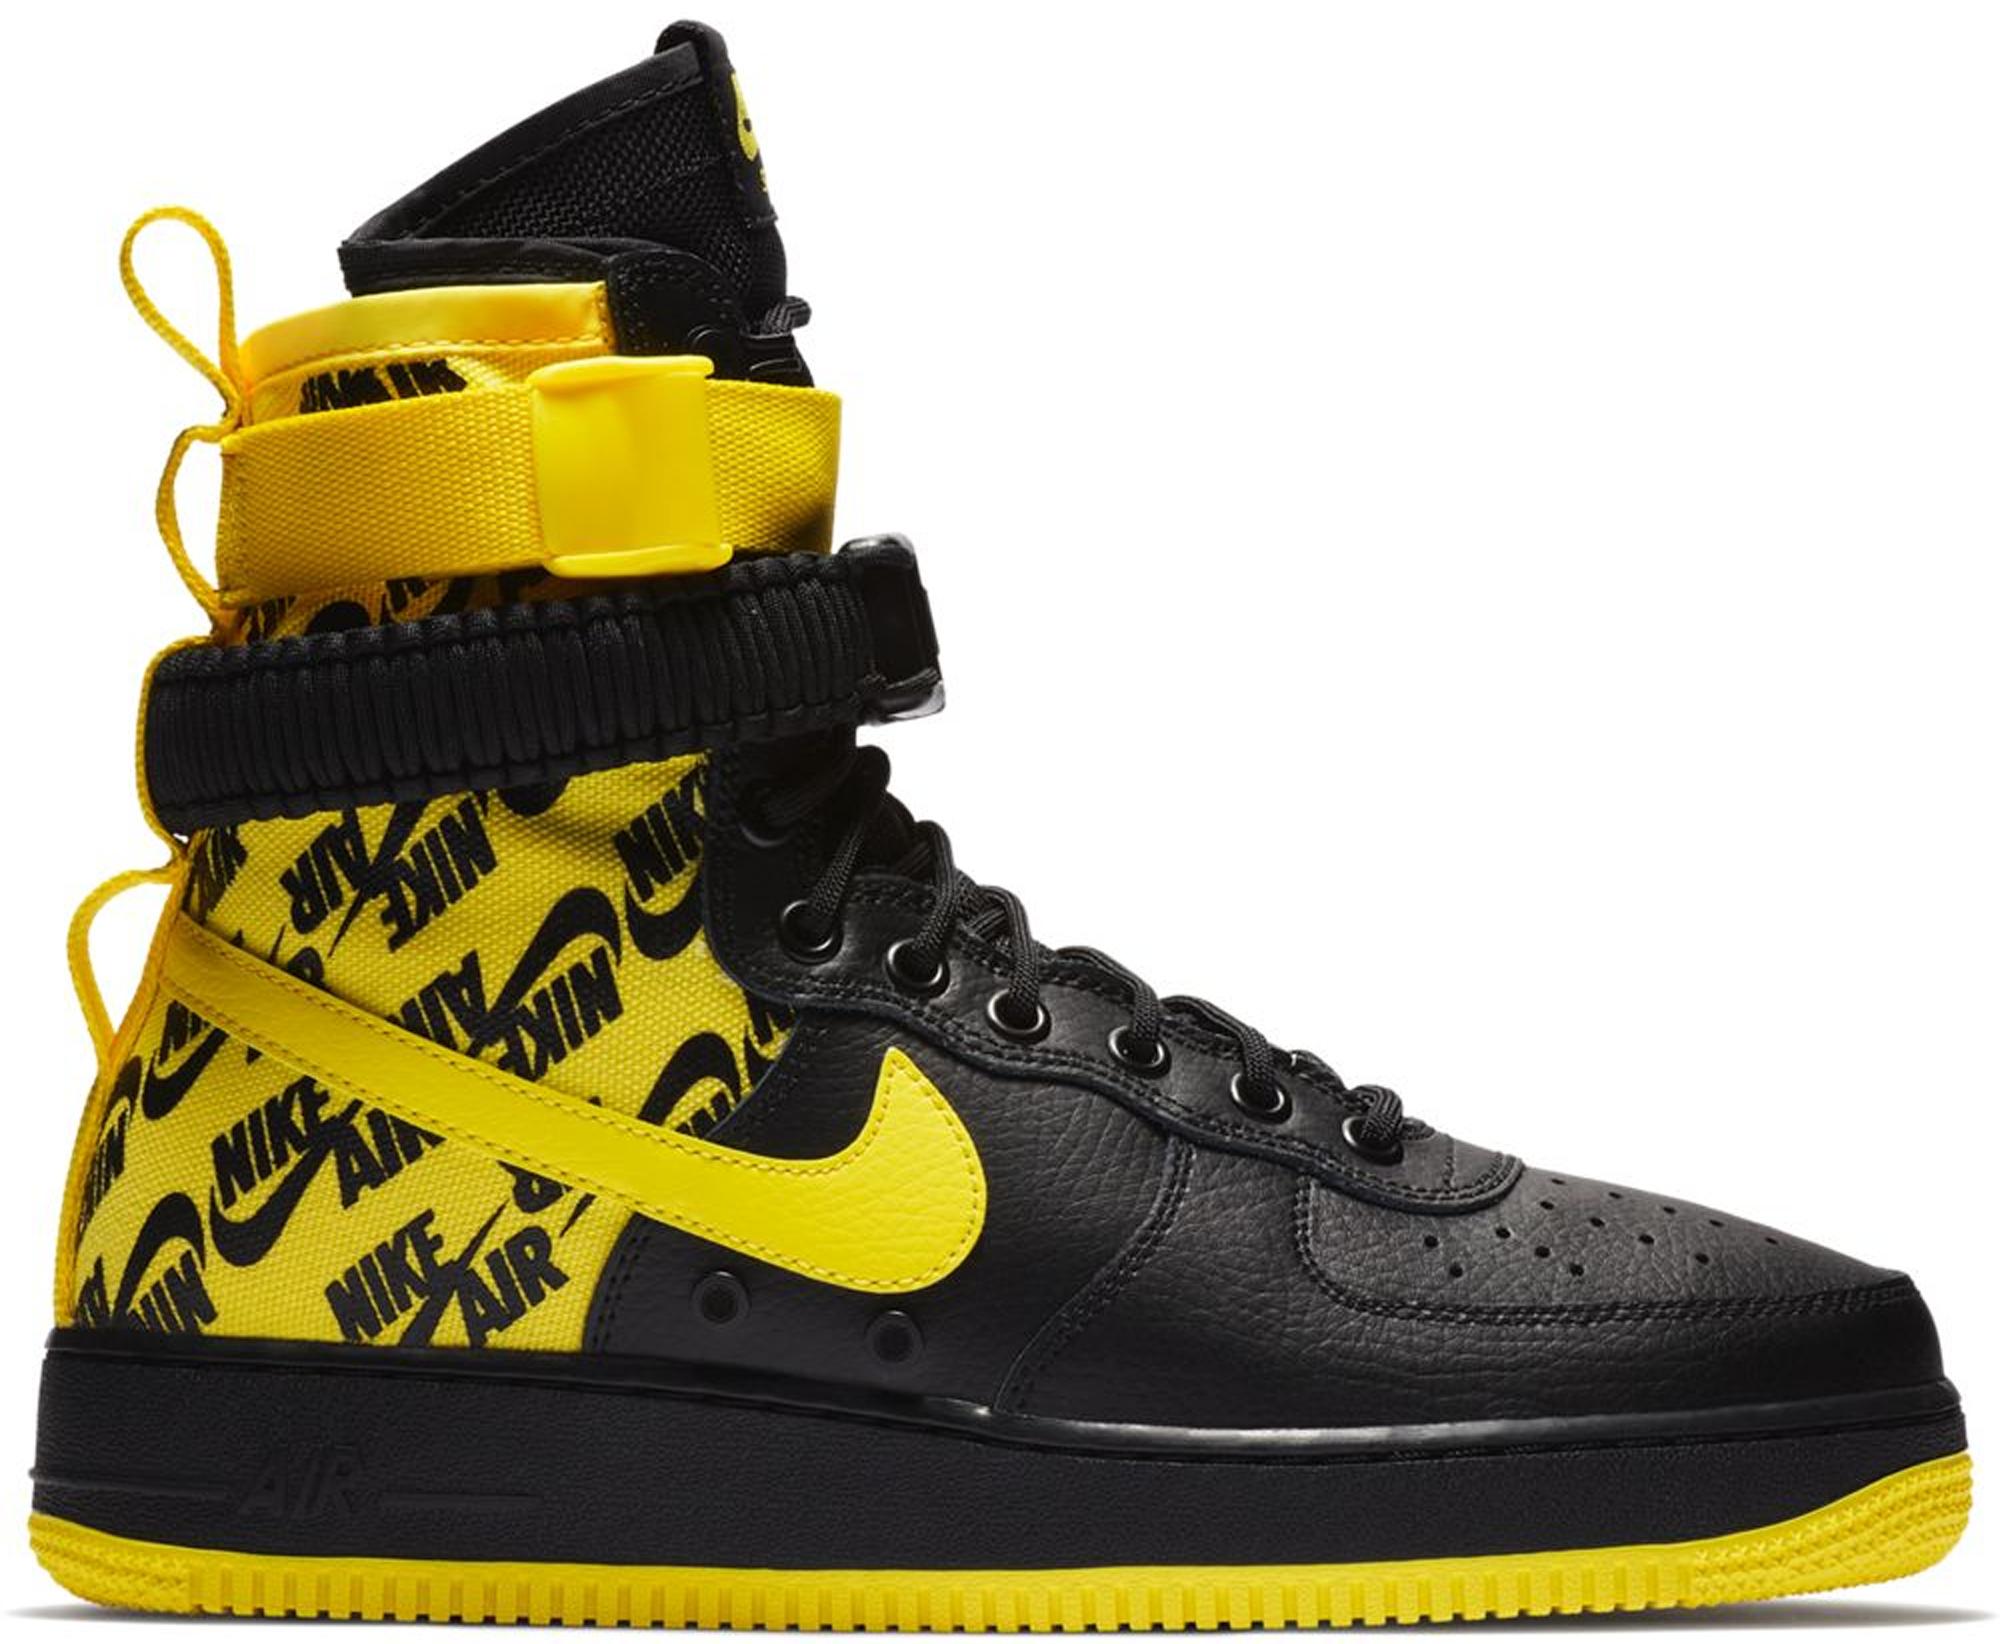 Nike SF Air Force 1 High Black Dynamic